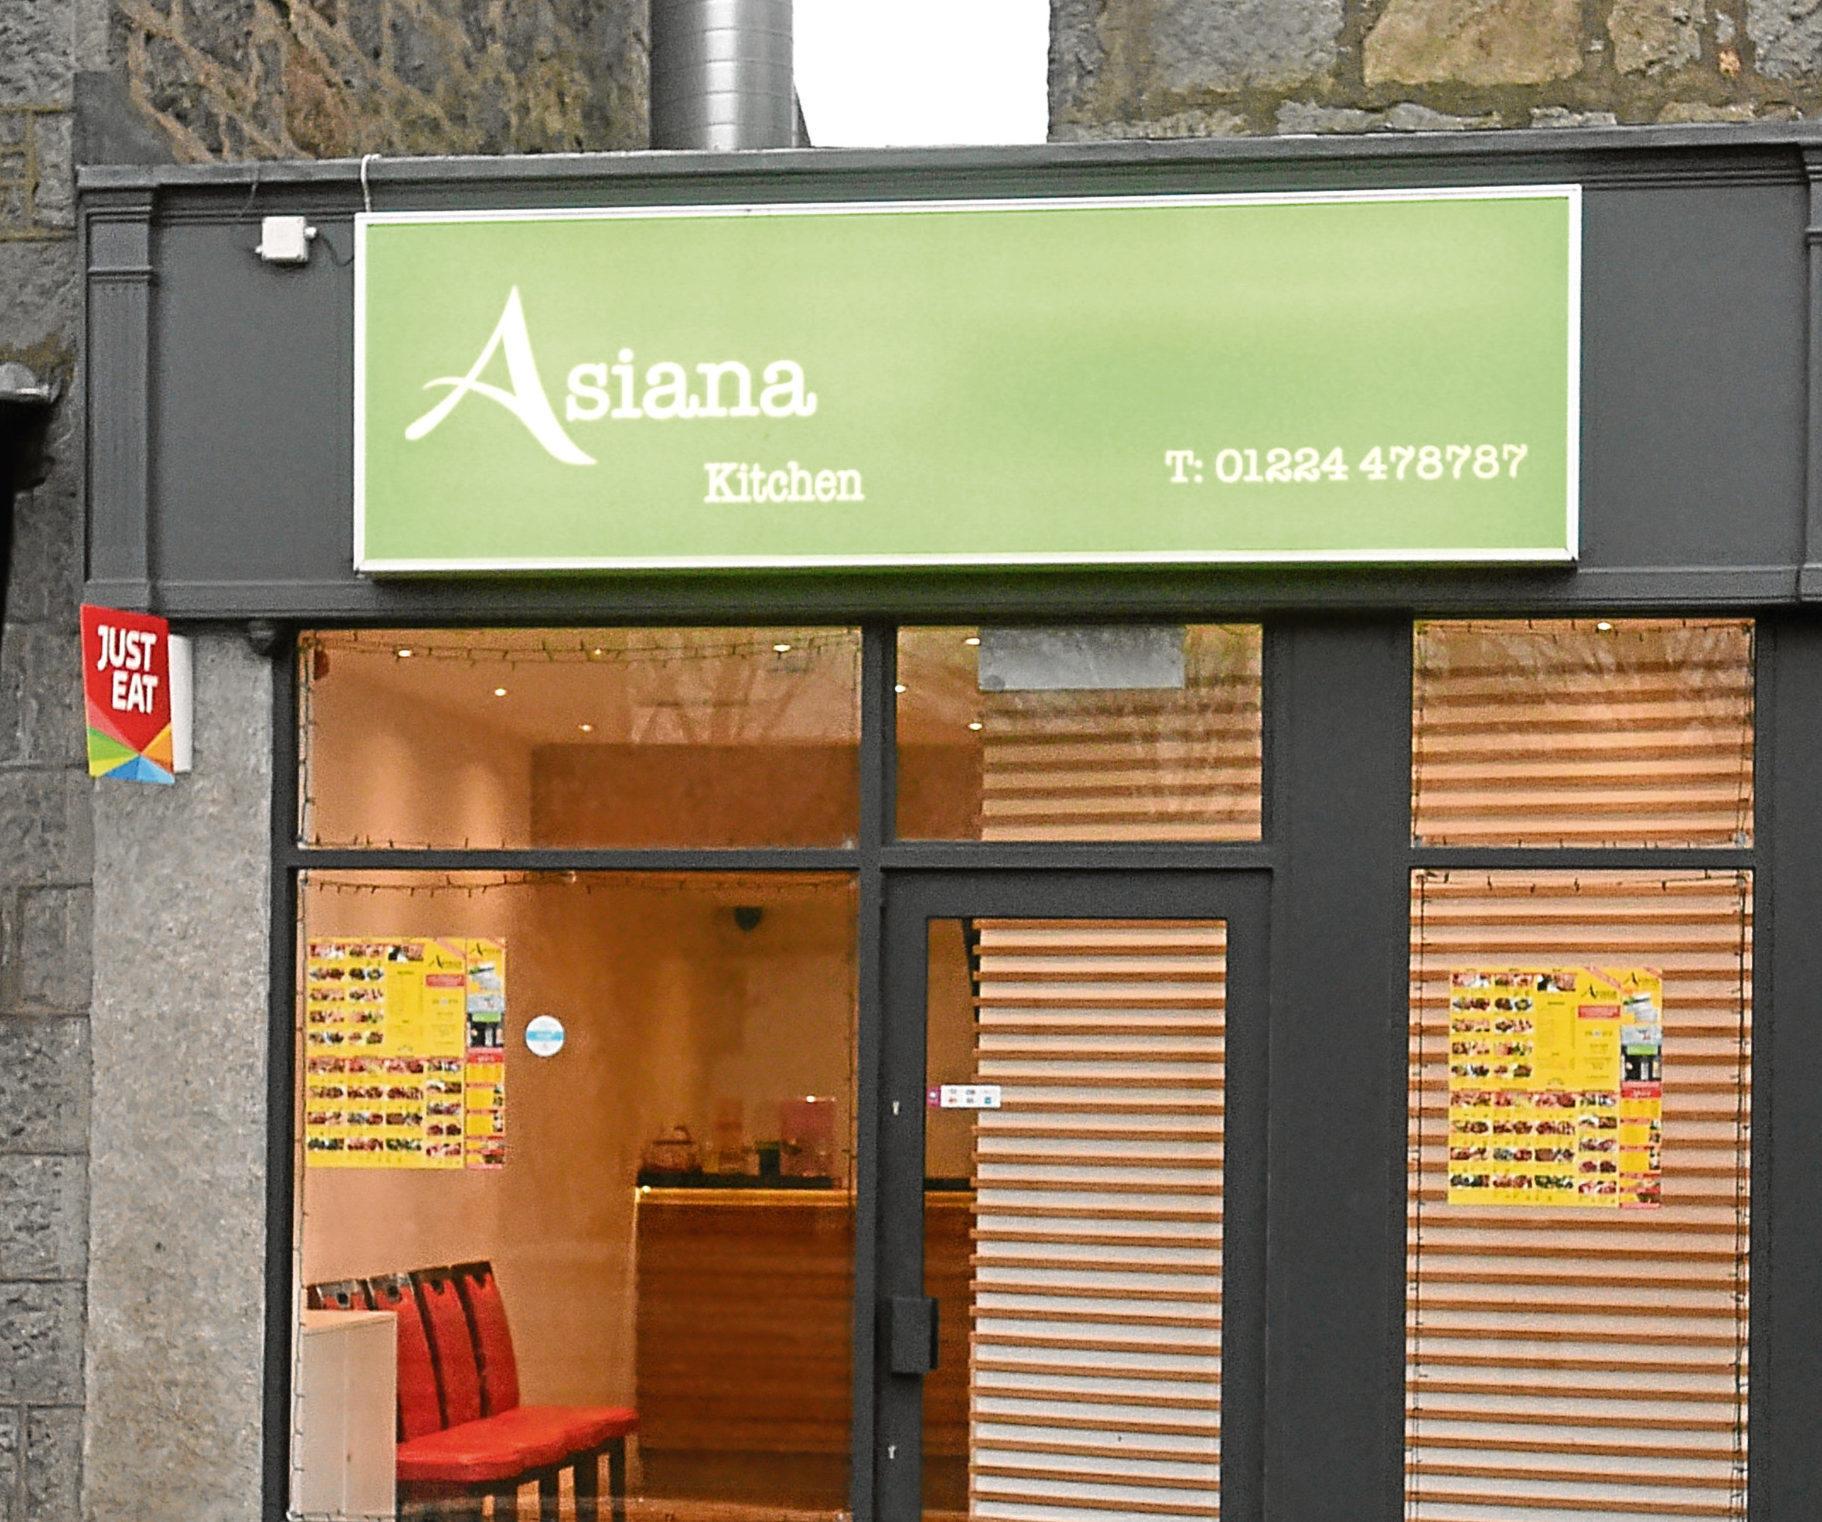 Asiana Kitchen